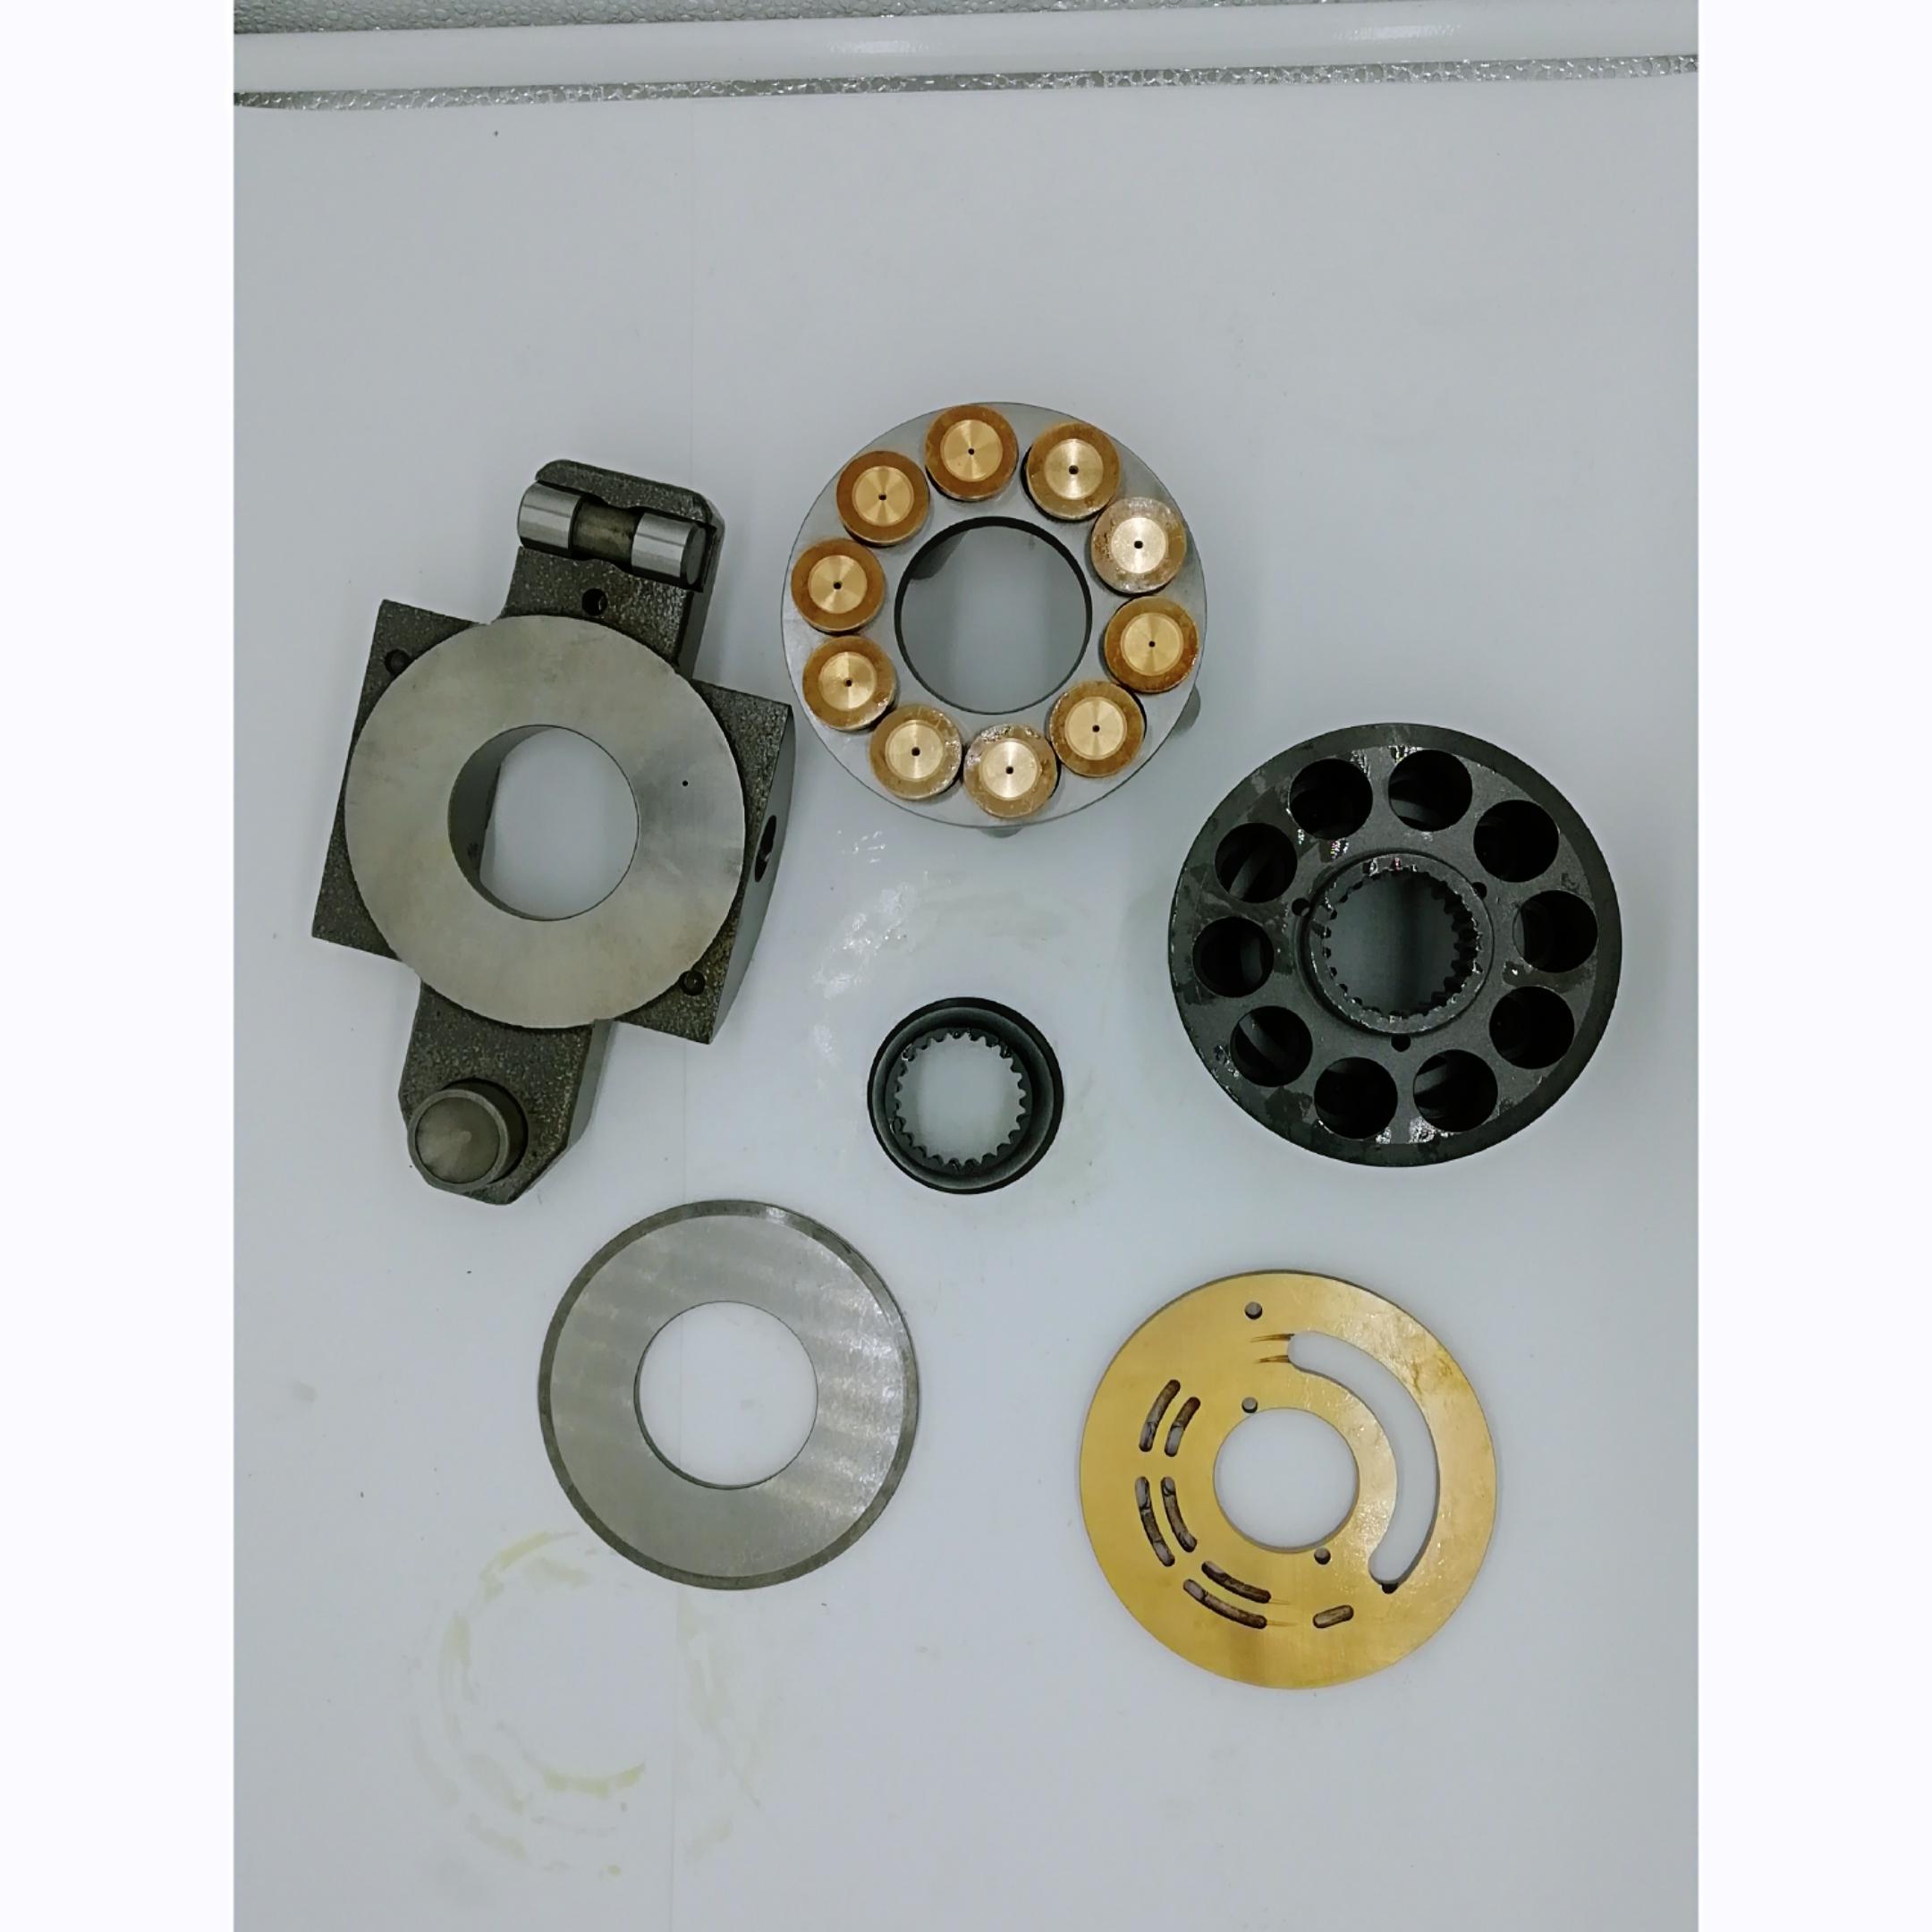 Kayaba PSVD2-21E Hydraulic piston pump spares parts